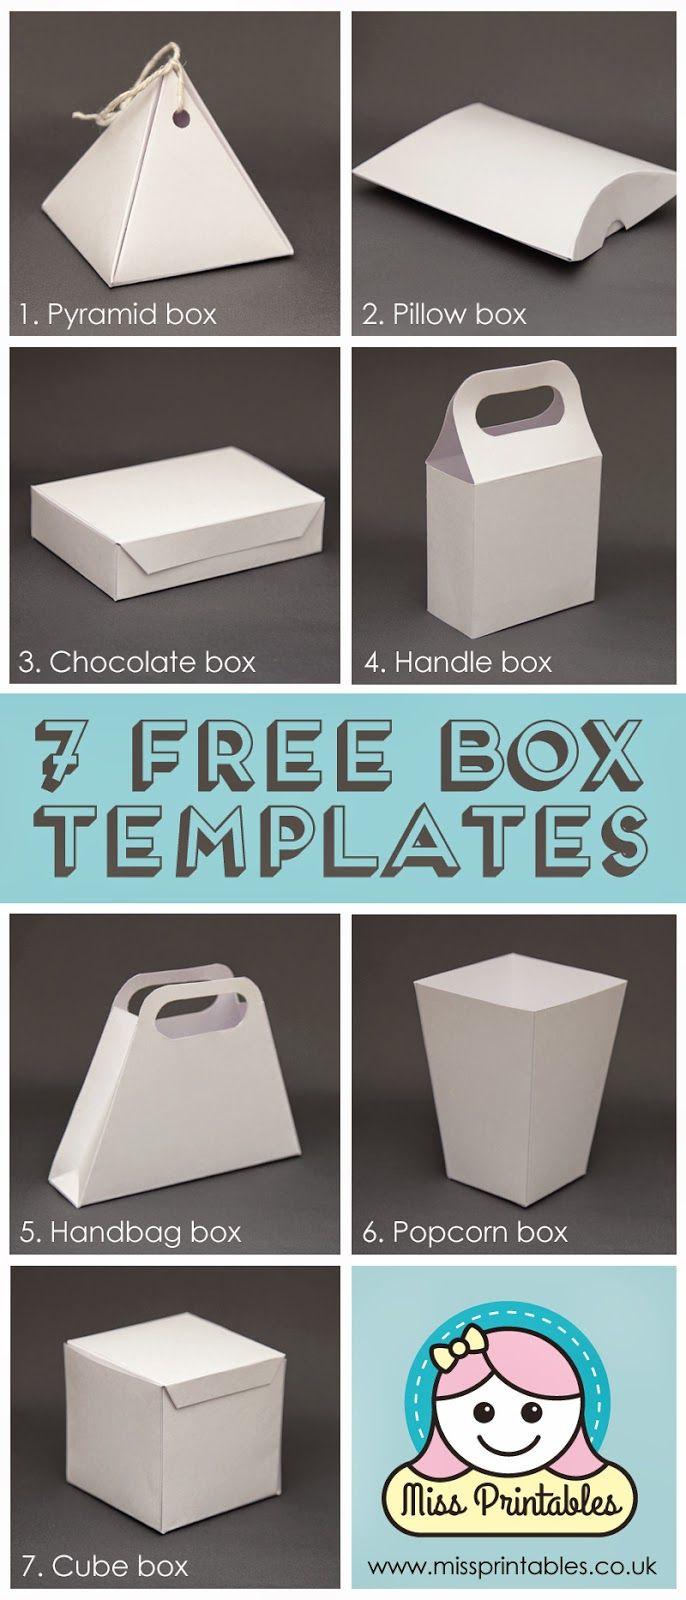 Box Template Free | Templates & Paper Folding | Pinterest | Diy Gift - Gift Box Templates Free Printable